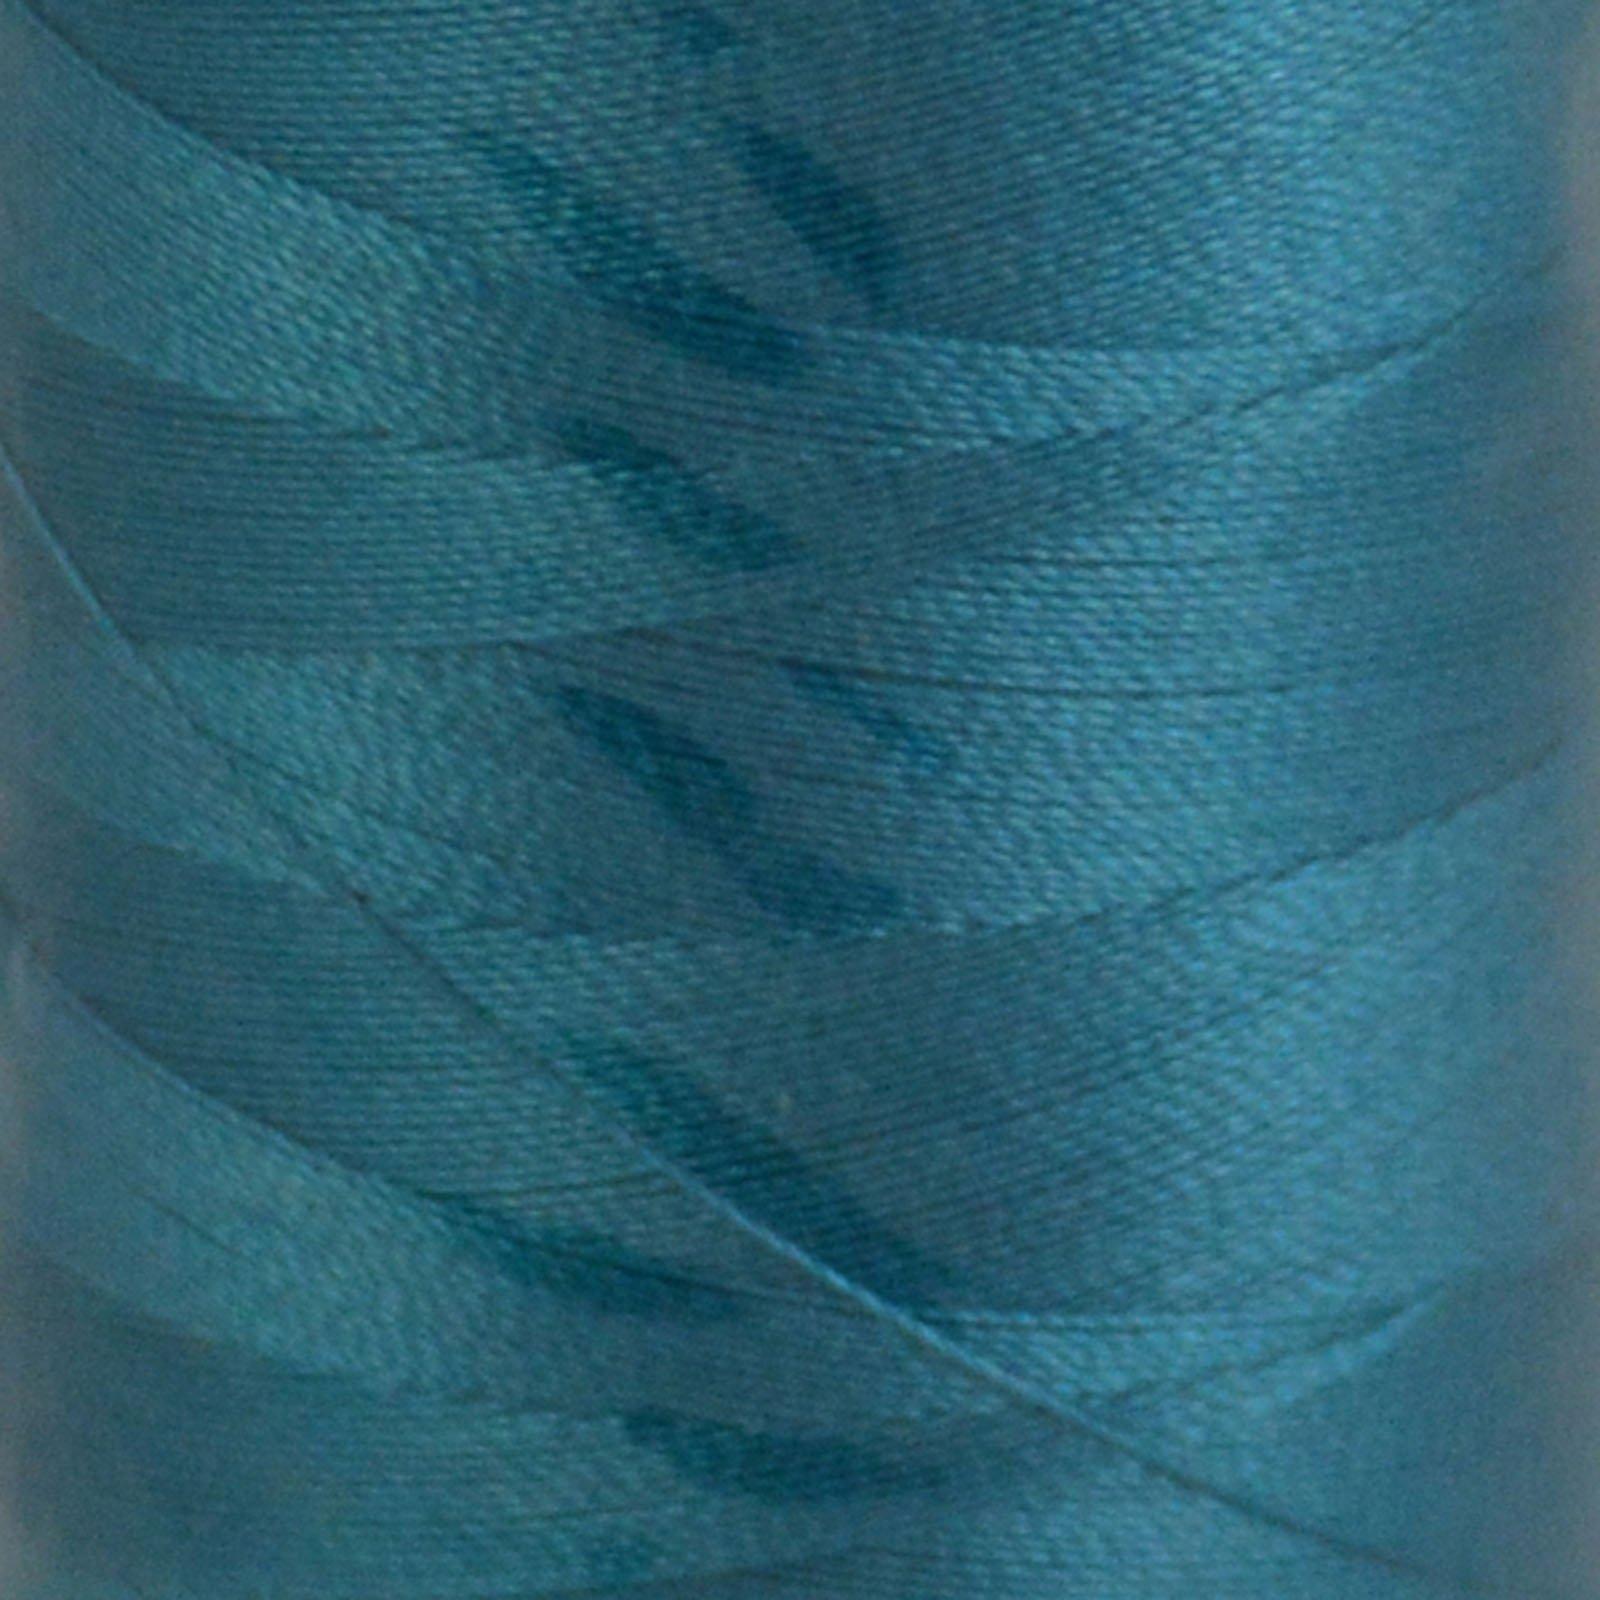 # 4182 Dark Turquoise